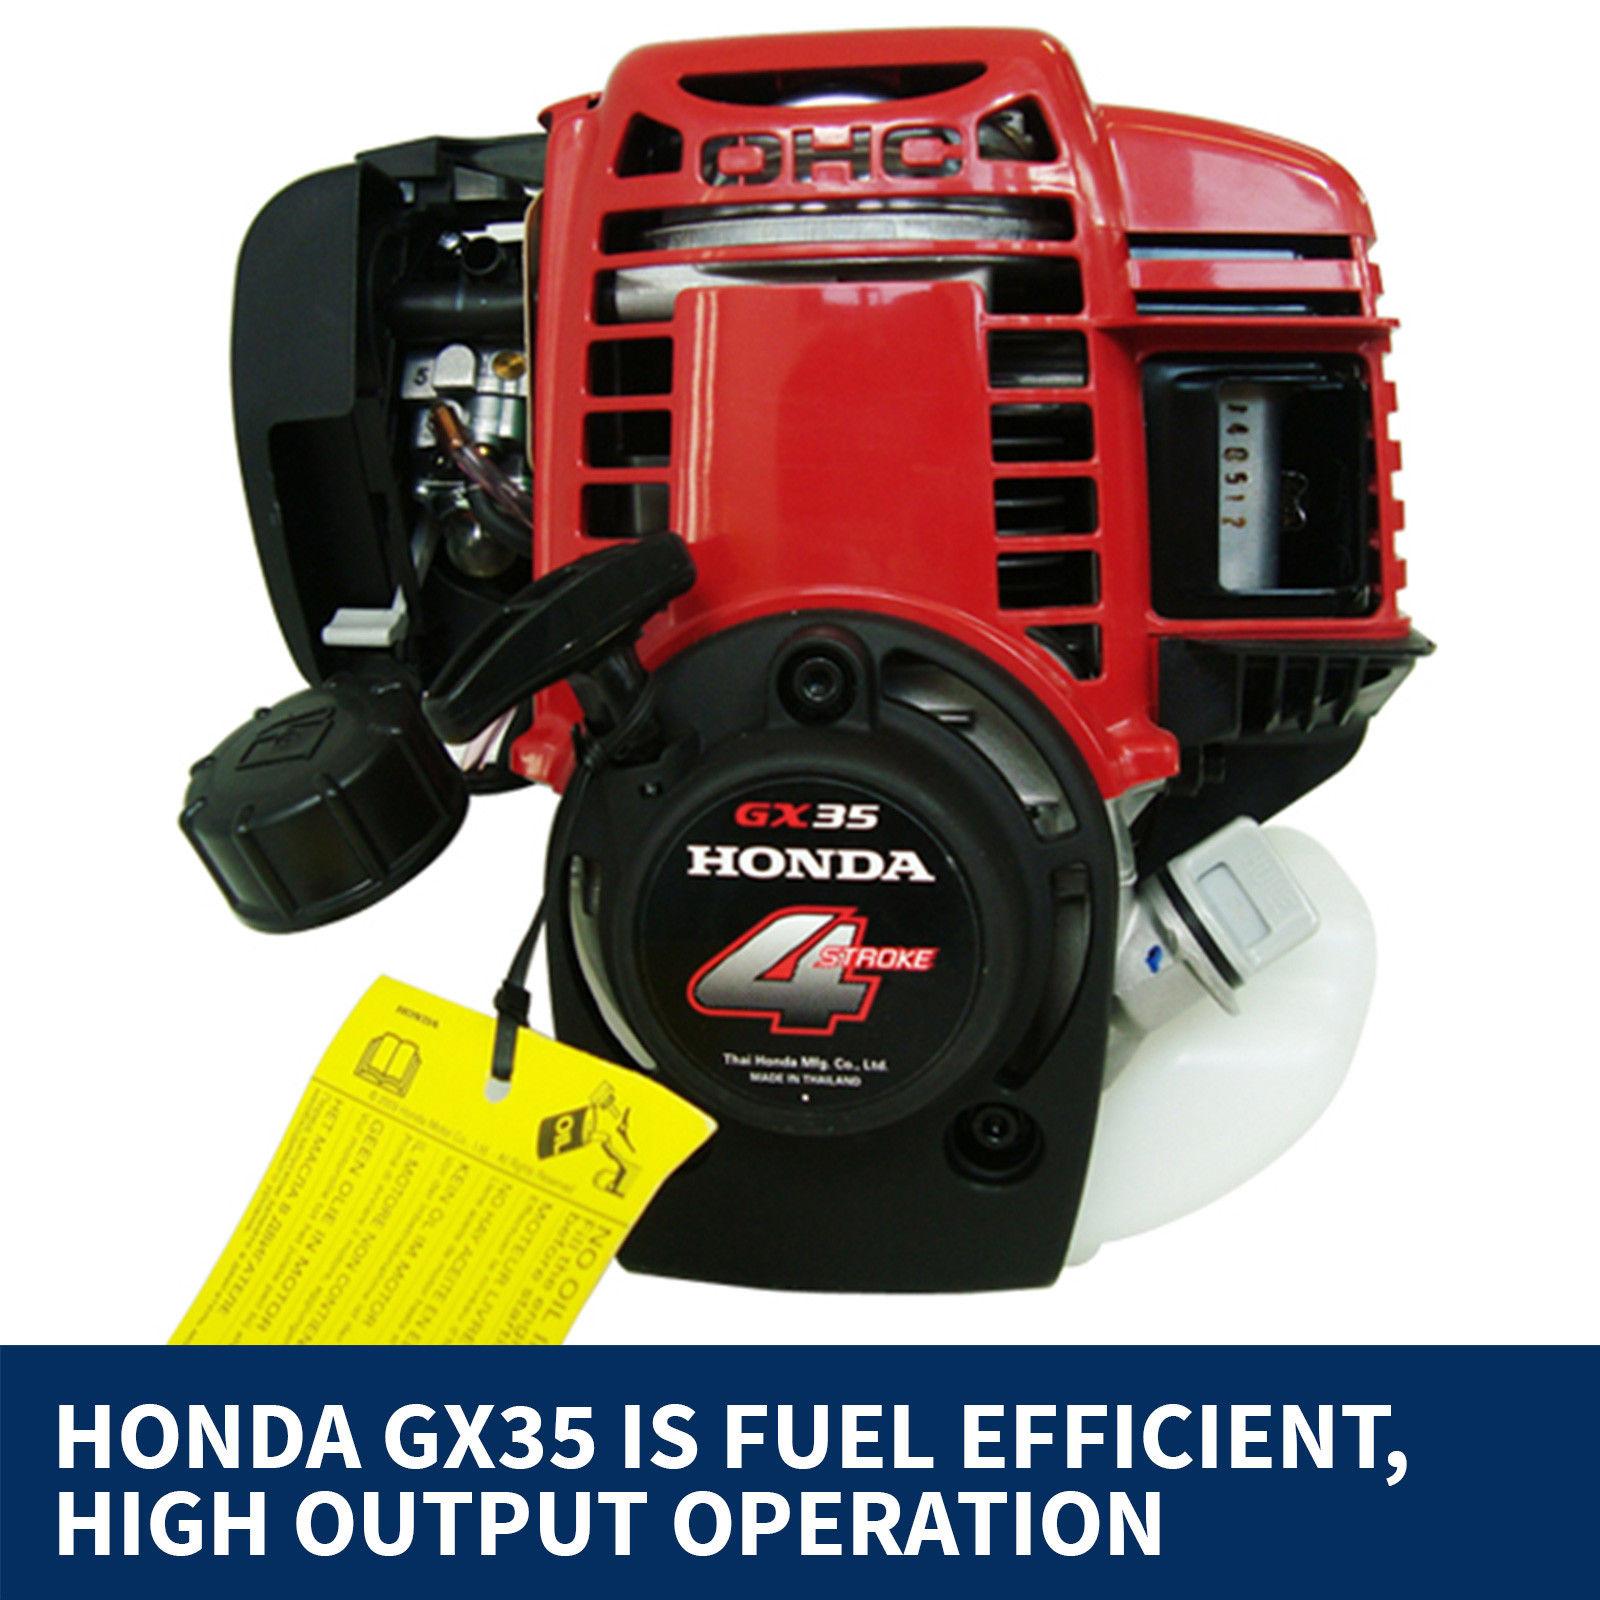 Motore a benzina a 4 tempi Motore a benzina a 4 tempi per decespugliatore Motore GX35 35,8cc Omologato CE